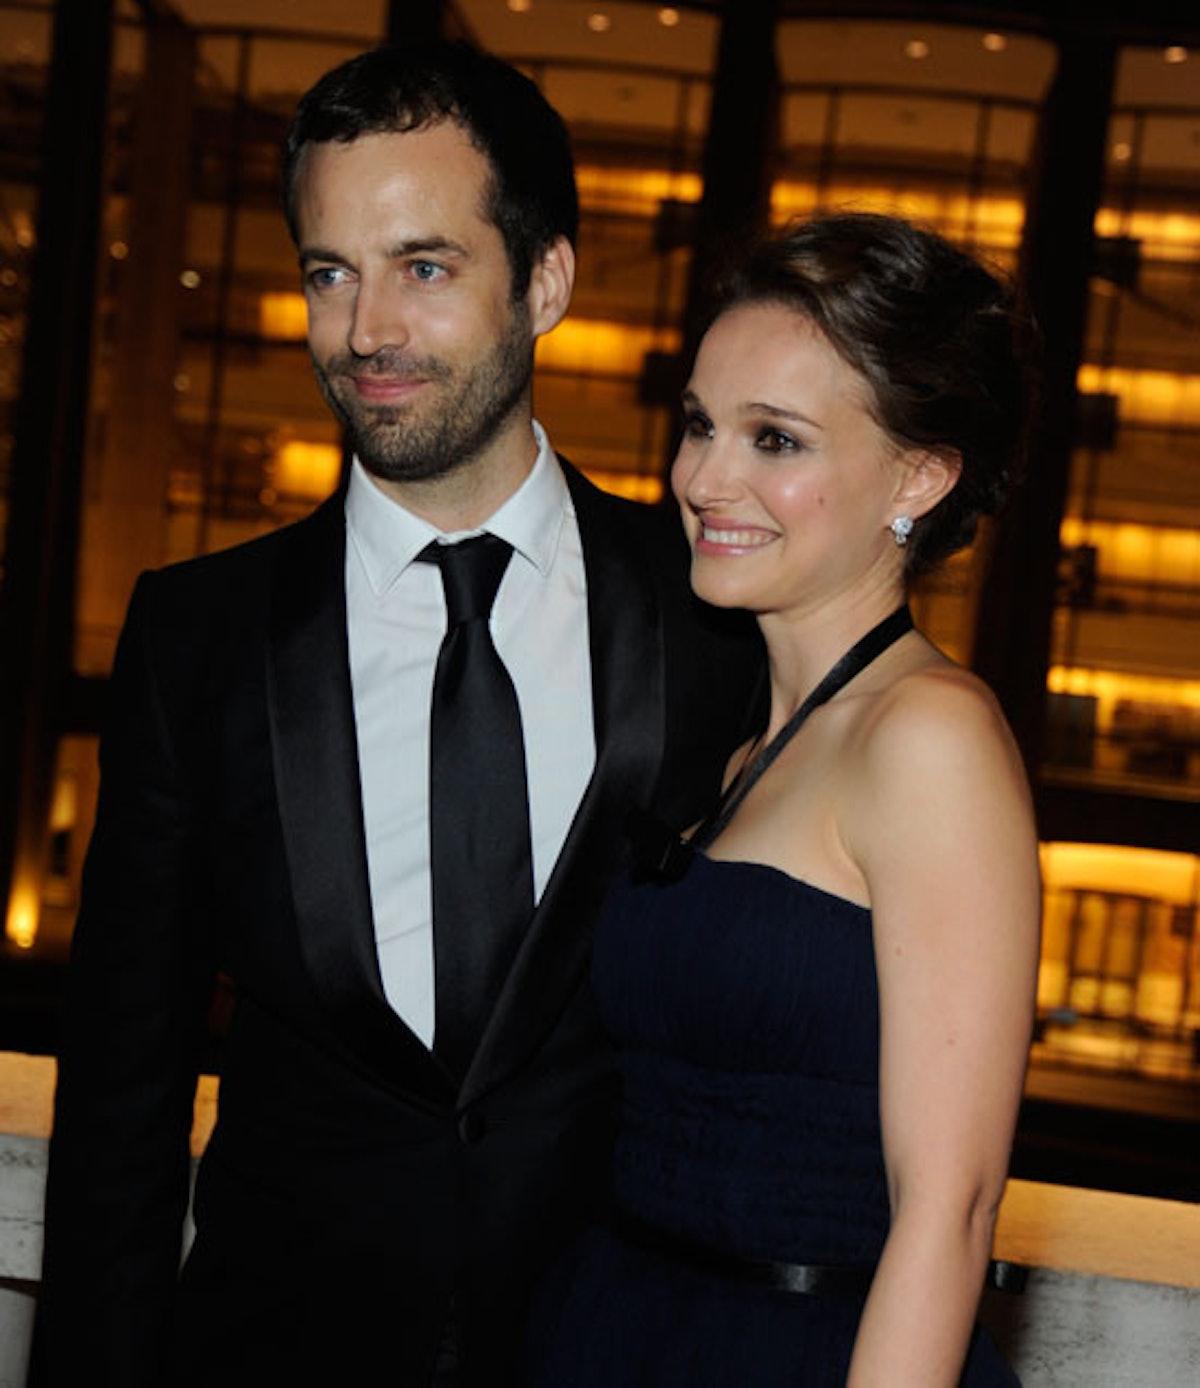 blog-nycb-Benjamin-Millepied-and-Natalie-Portman.jpg